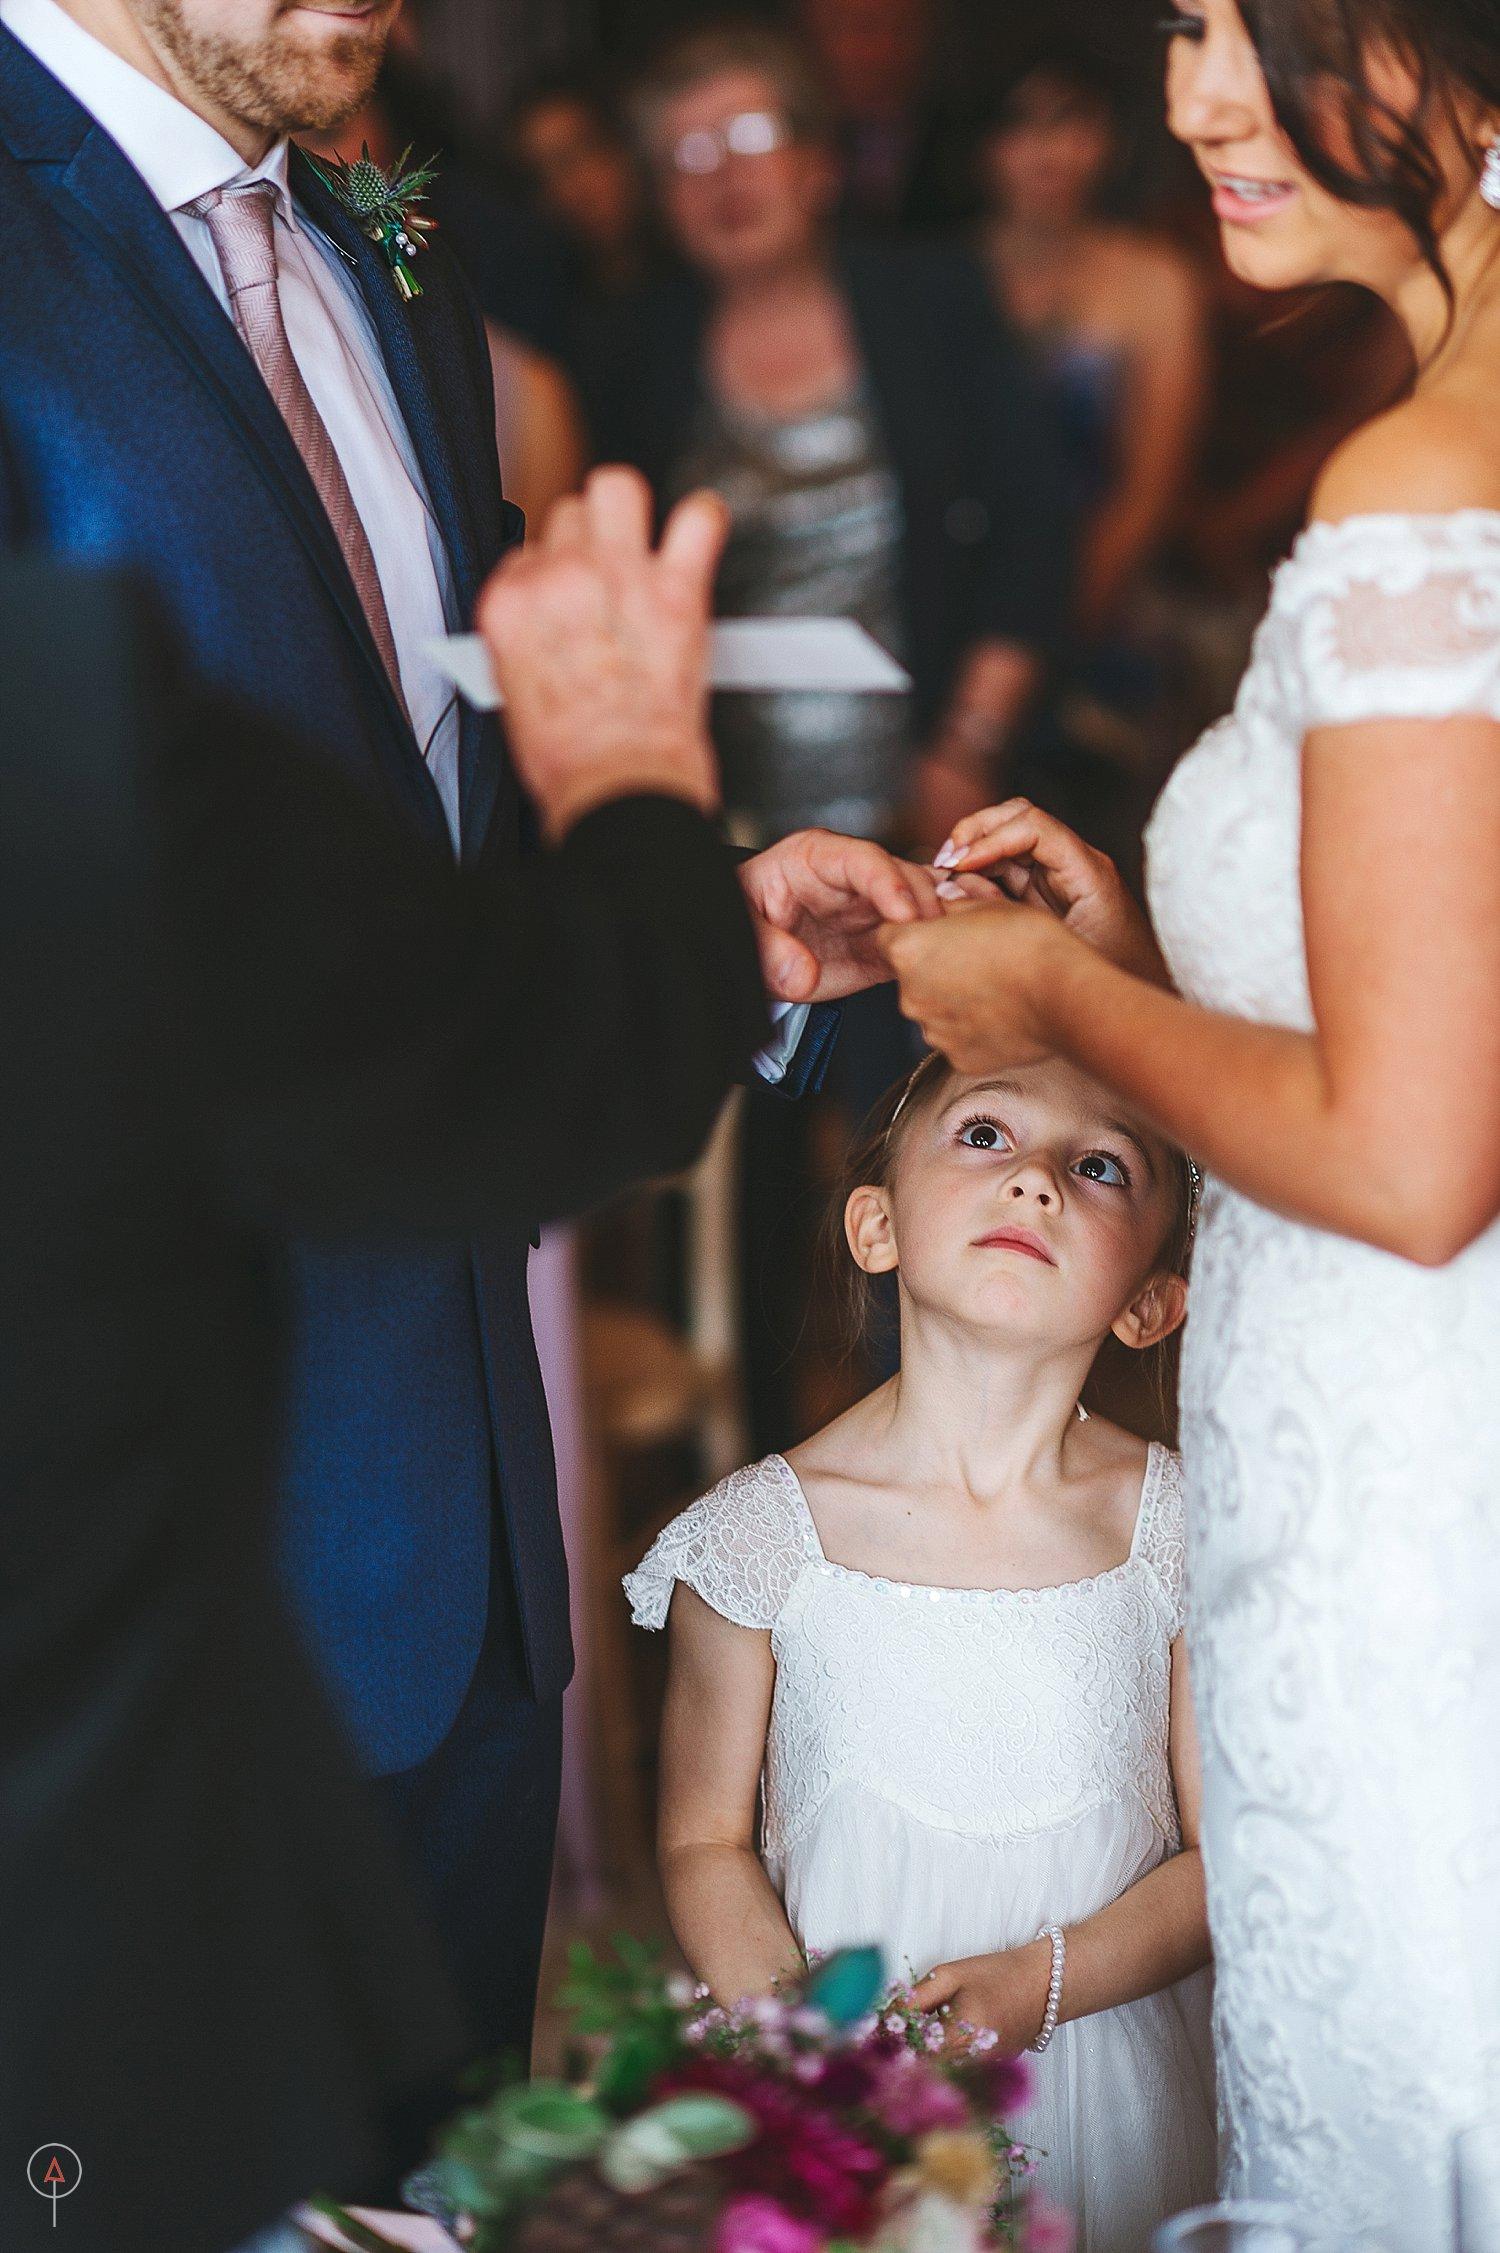 aga-tomaszek-wedding-photographer-cardiff_1270